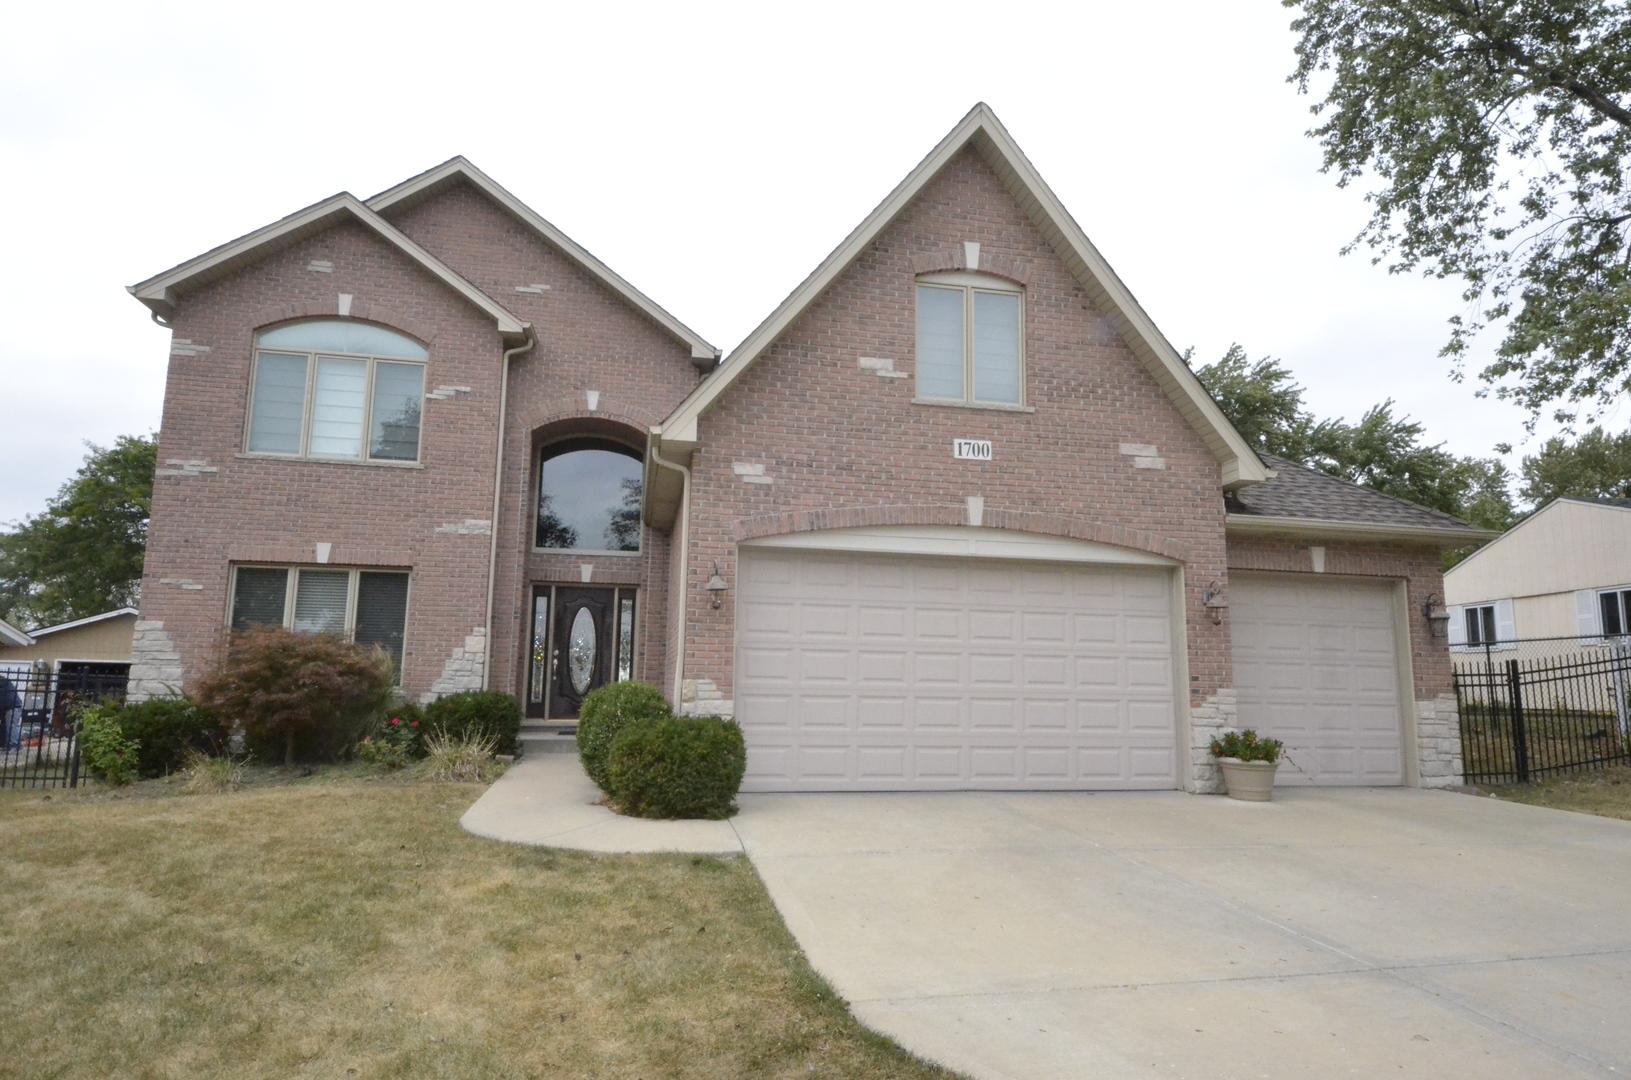 1700 Winchester Lane, Schaumburg, Illinois